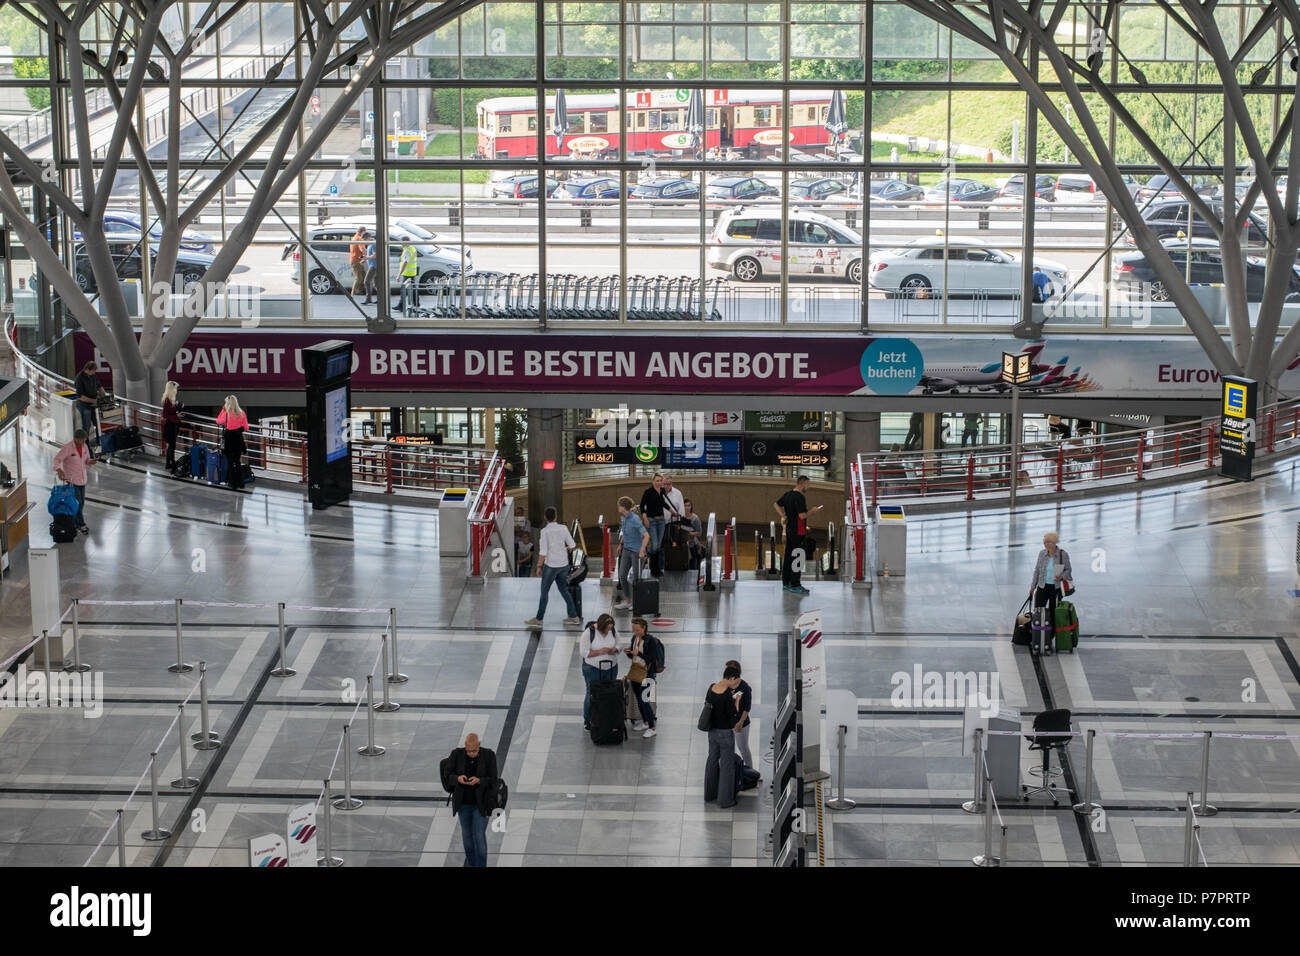 terminal at stuttgart airport, germany - Stock Image